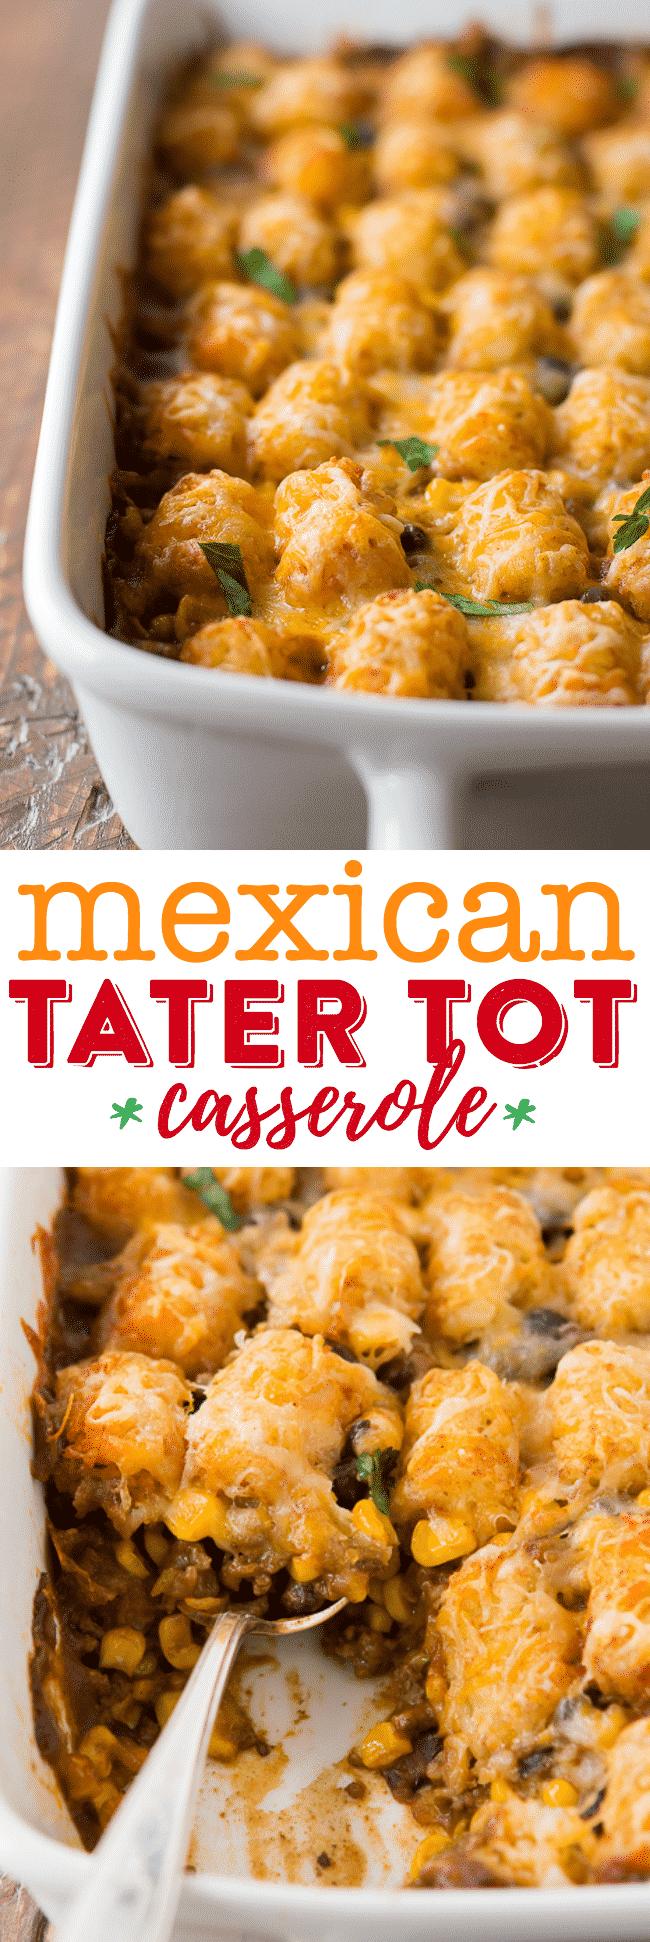 Mexican Tater Tot Casserole Recipe #dinnerrecipesforfamilymaindishes